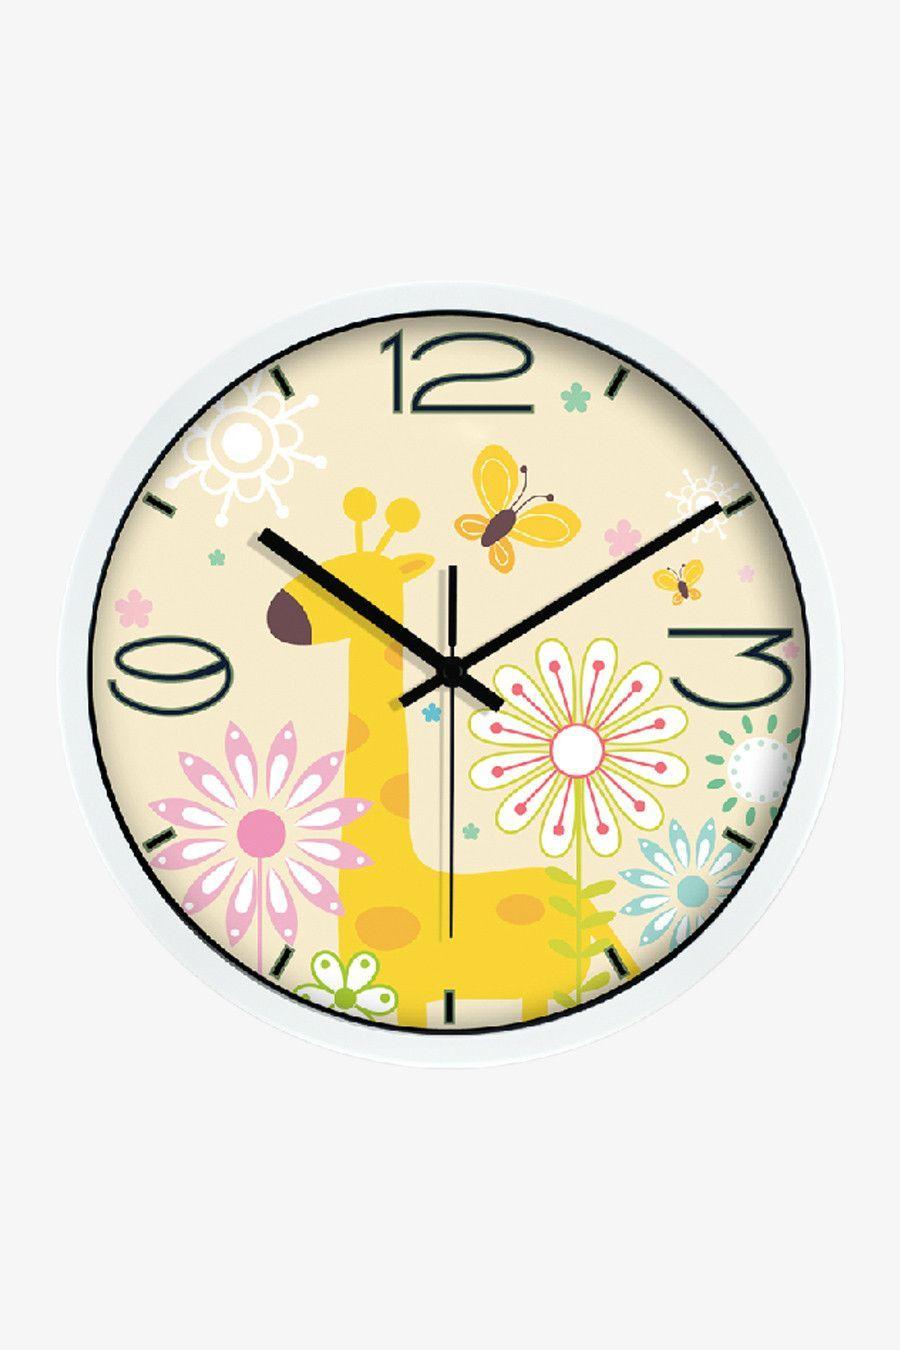 Giraffe Art Clock White | Art walls, Wall clocks and Clocks